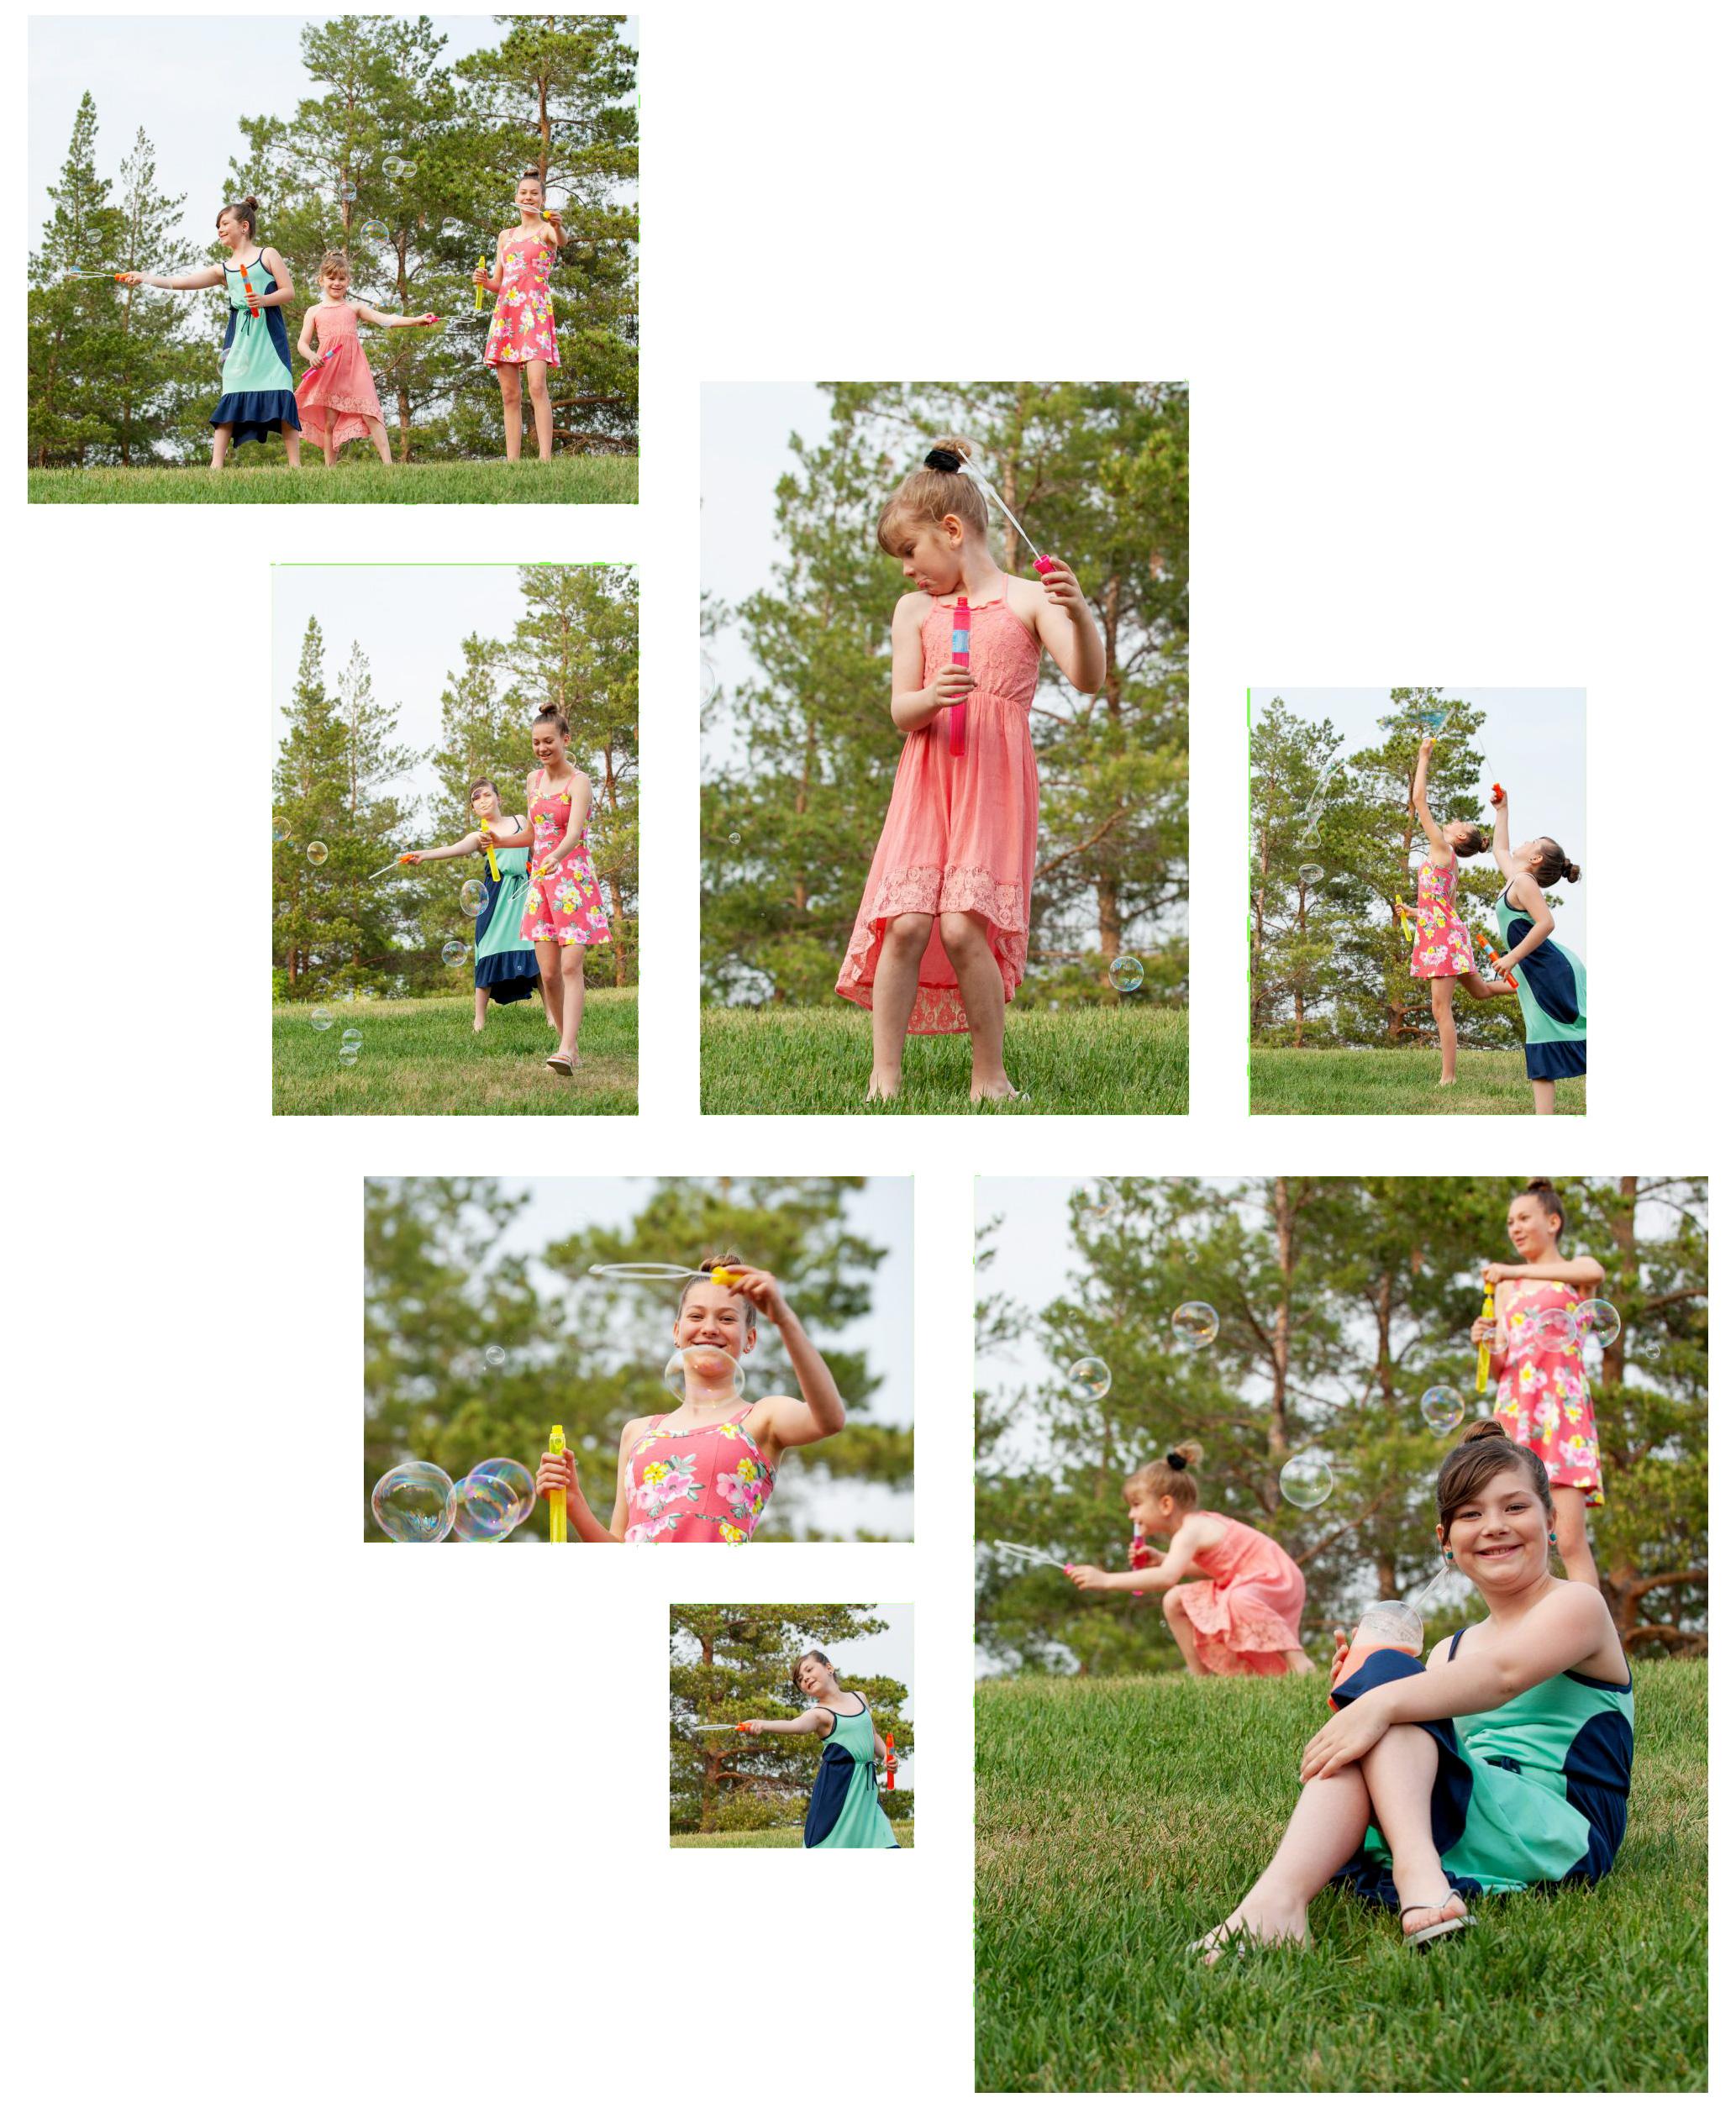 adorable-trio-free-lense-photo-02.jpg